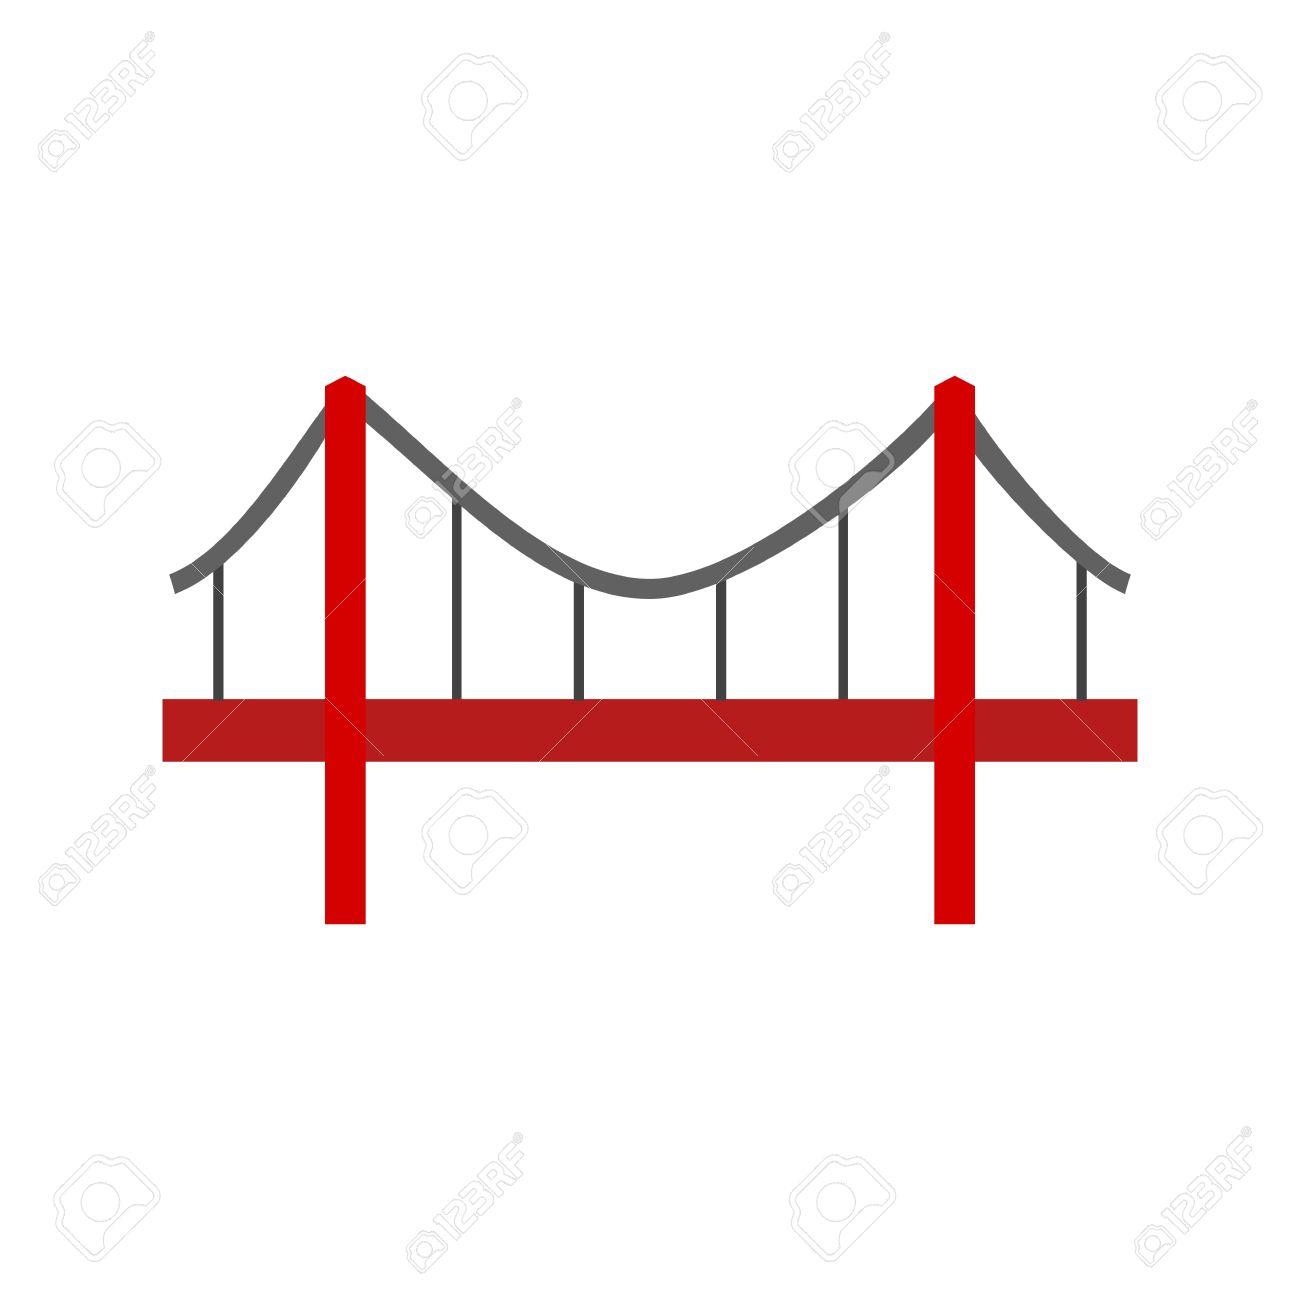 hight resolution of 1300x1300 bridge icons clipart